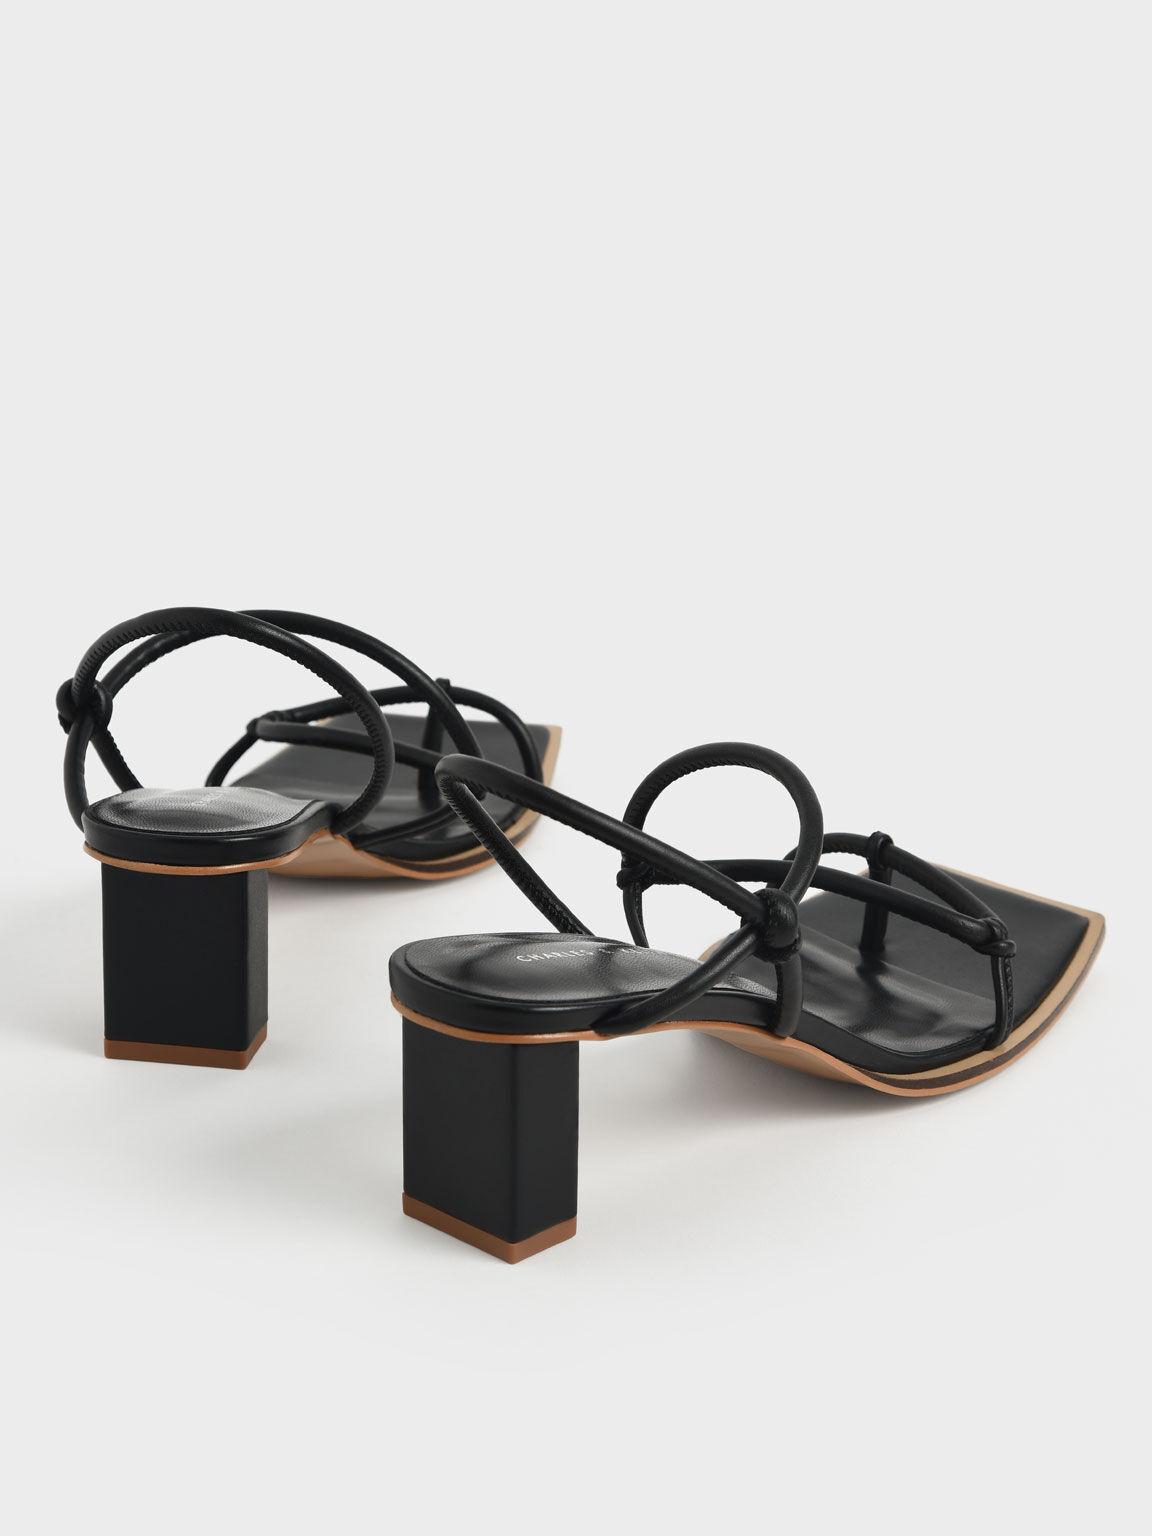 Strappy Toe-Loop Heeled Sandals, Black, hi-res